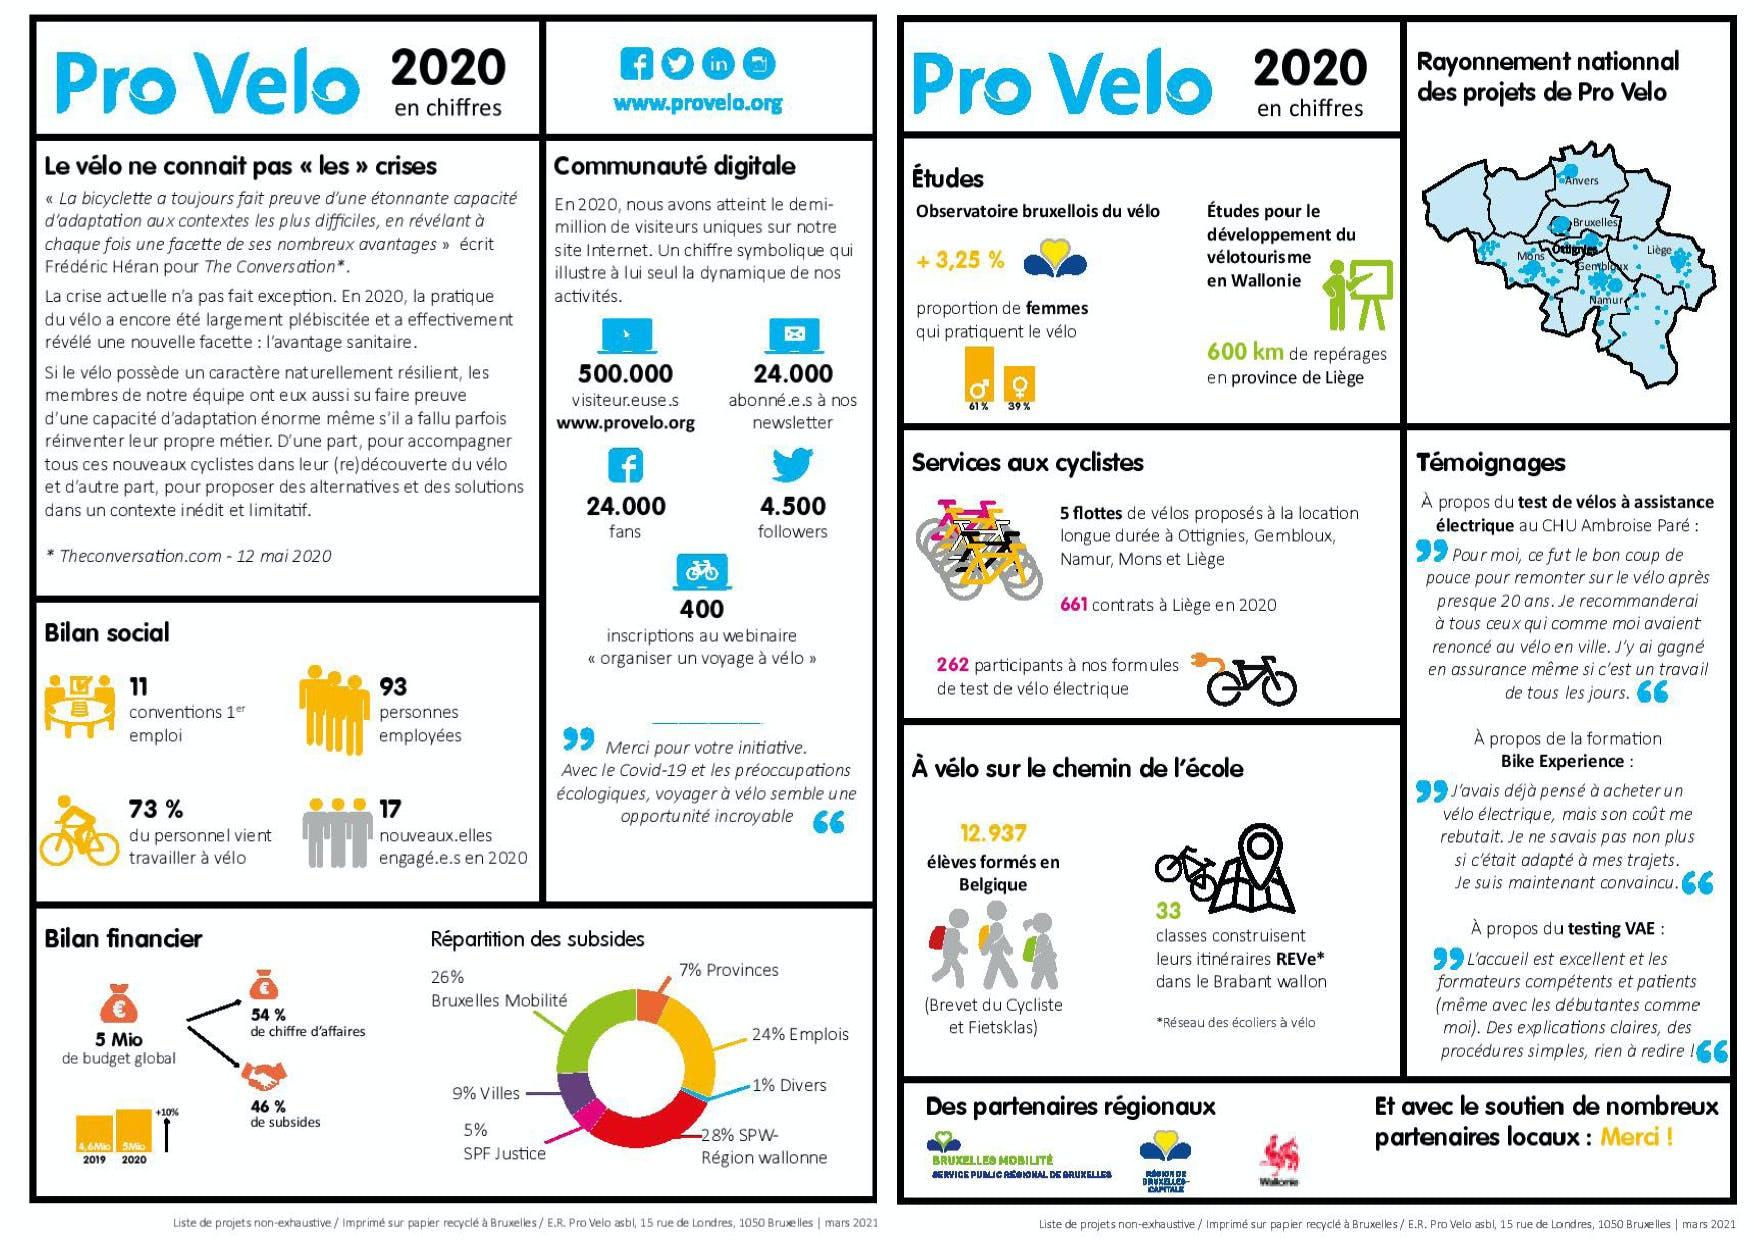 Pro Velo 2020 en chiffres